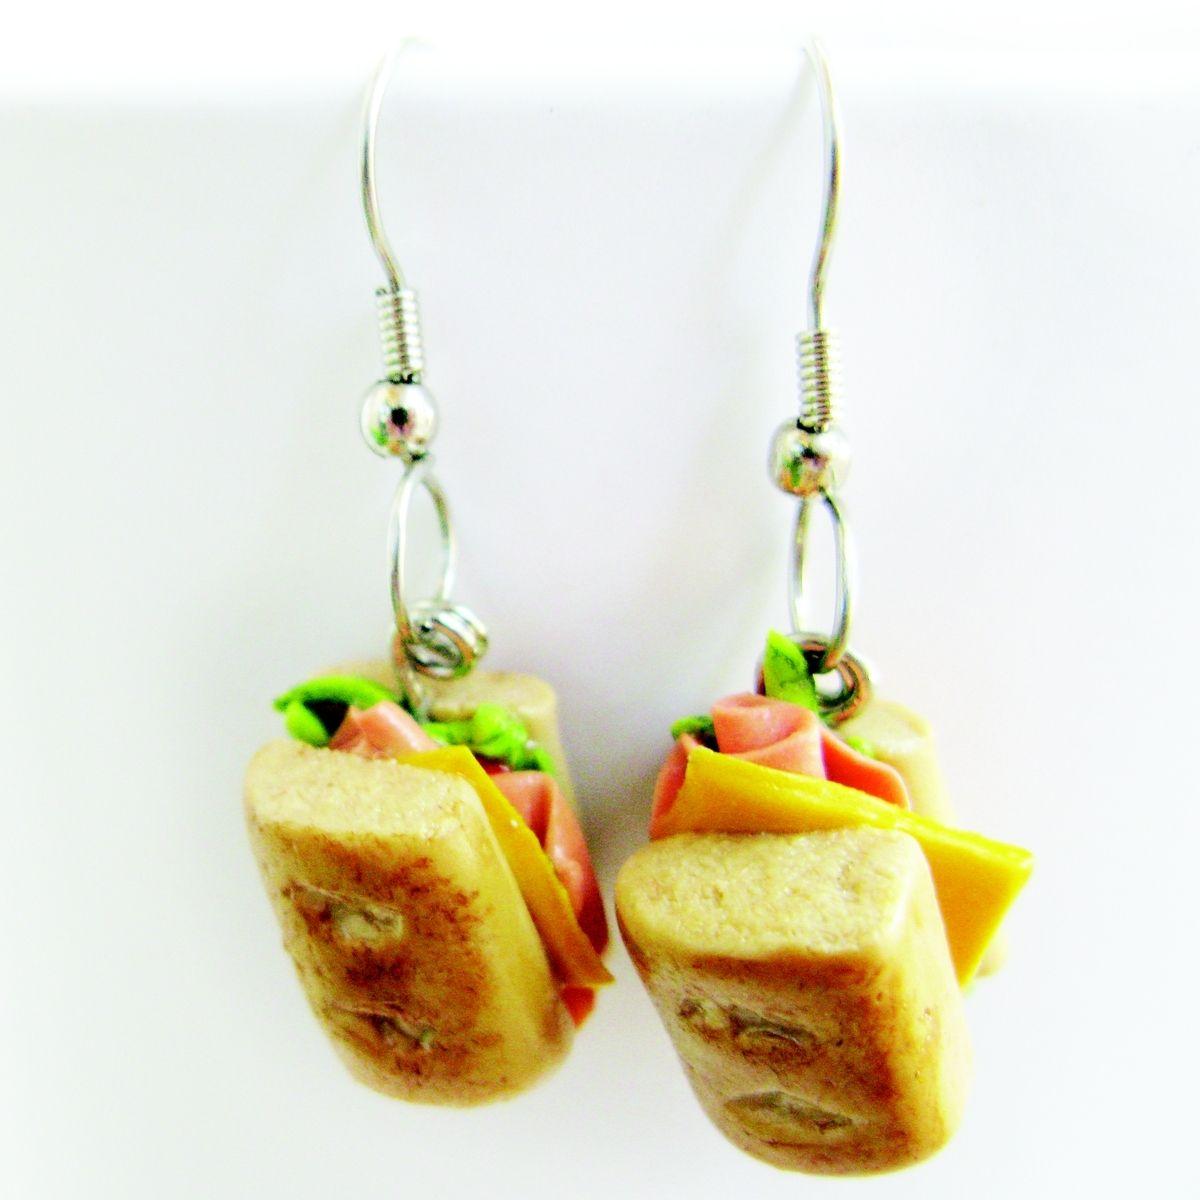 Handmade Food Earrings By Mashia Crafts BycreArte